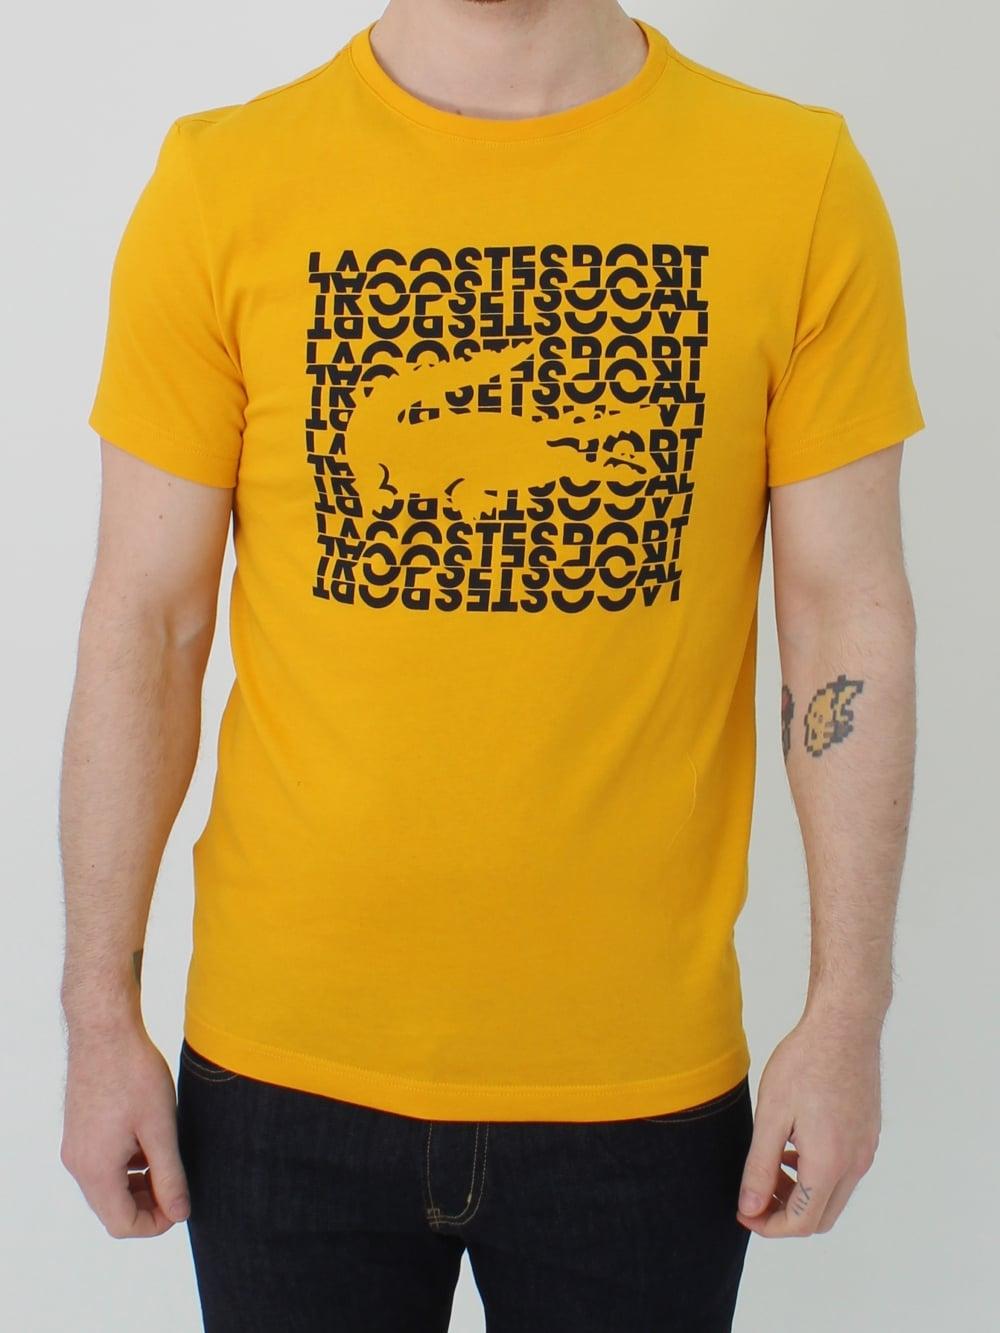 cfbe5d2c Graphic Logo Croc T.shirt - Buttercup